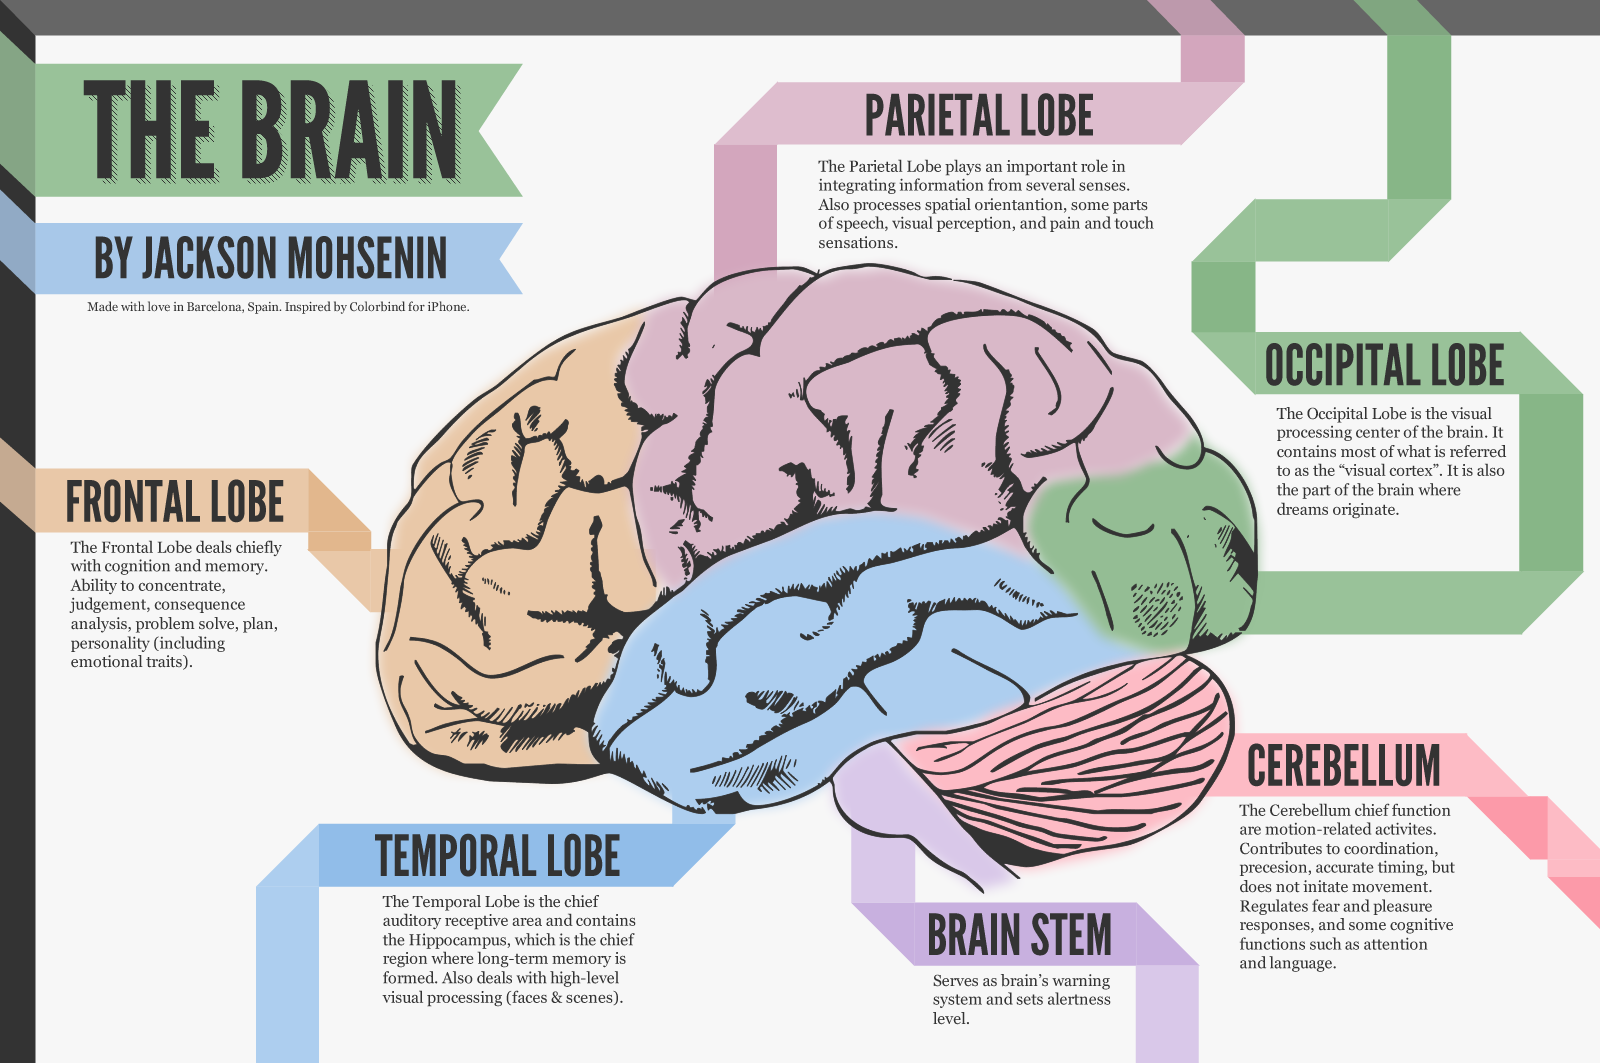 Brain regions science and nature nerd 101 pinterest